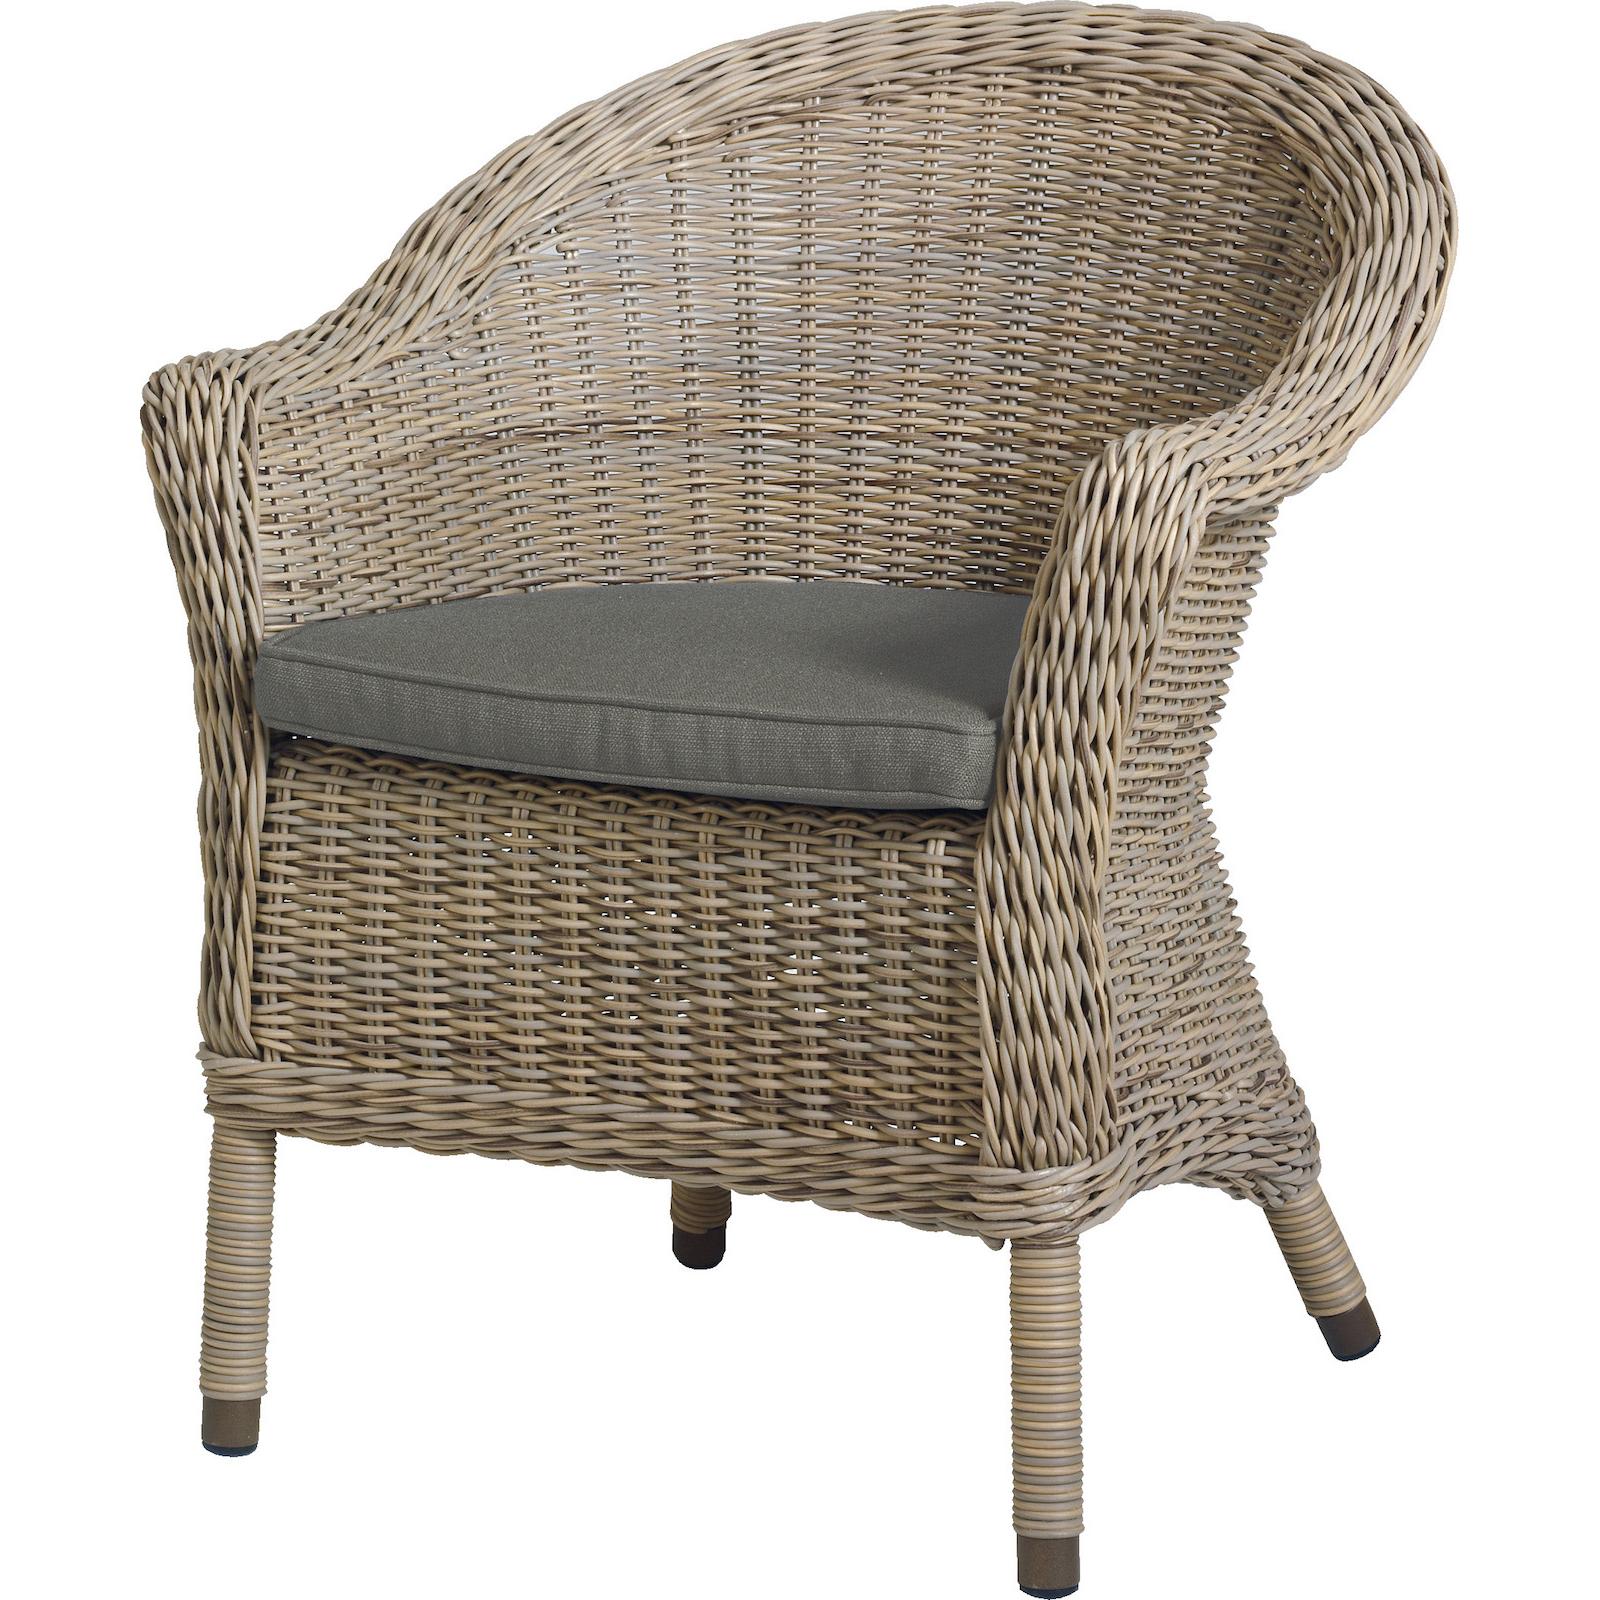 Beautiful Outdoor Sessel Polyrattan Contemporary - Best Einrichtungs ...